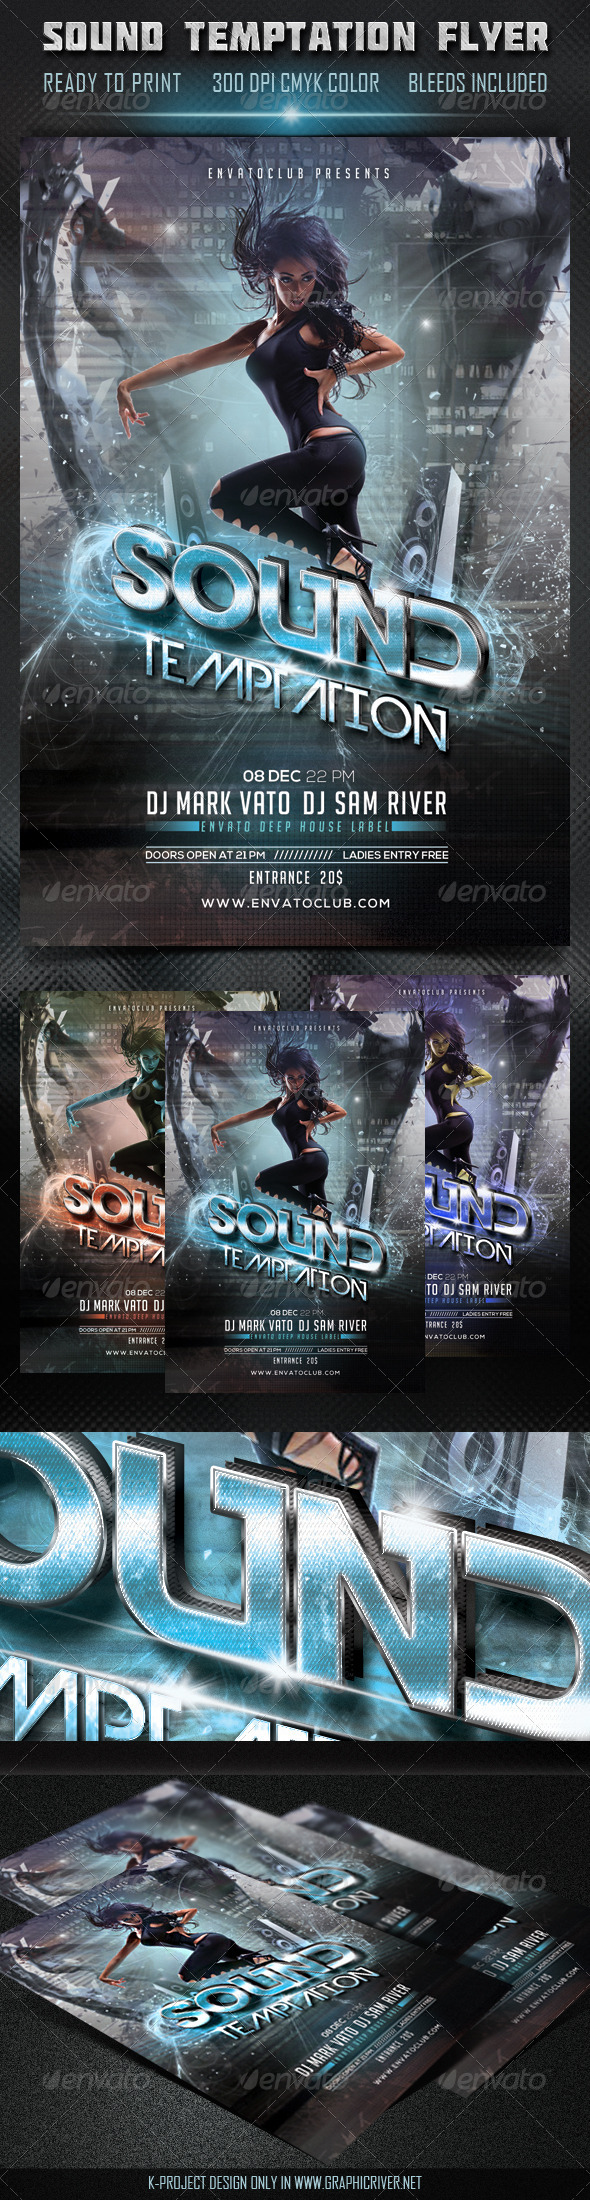 Sound Temptation Flyer - Clubs & Parties Events